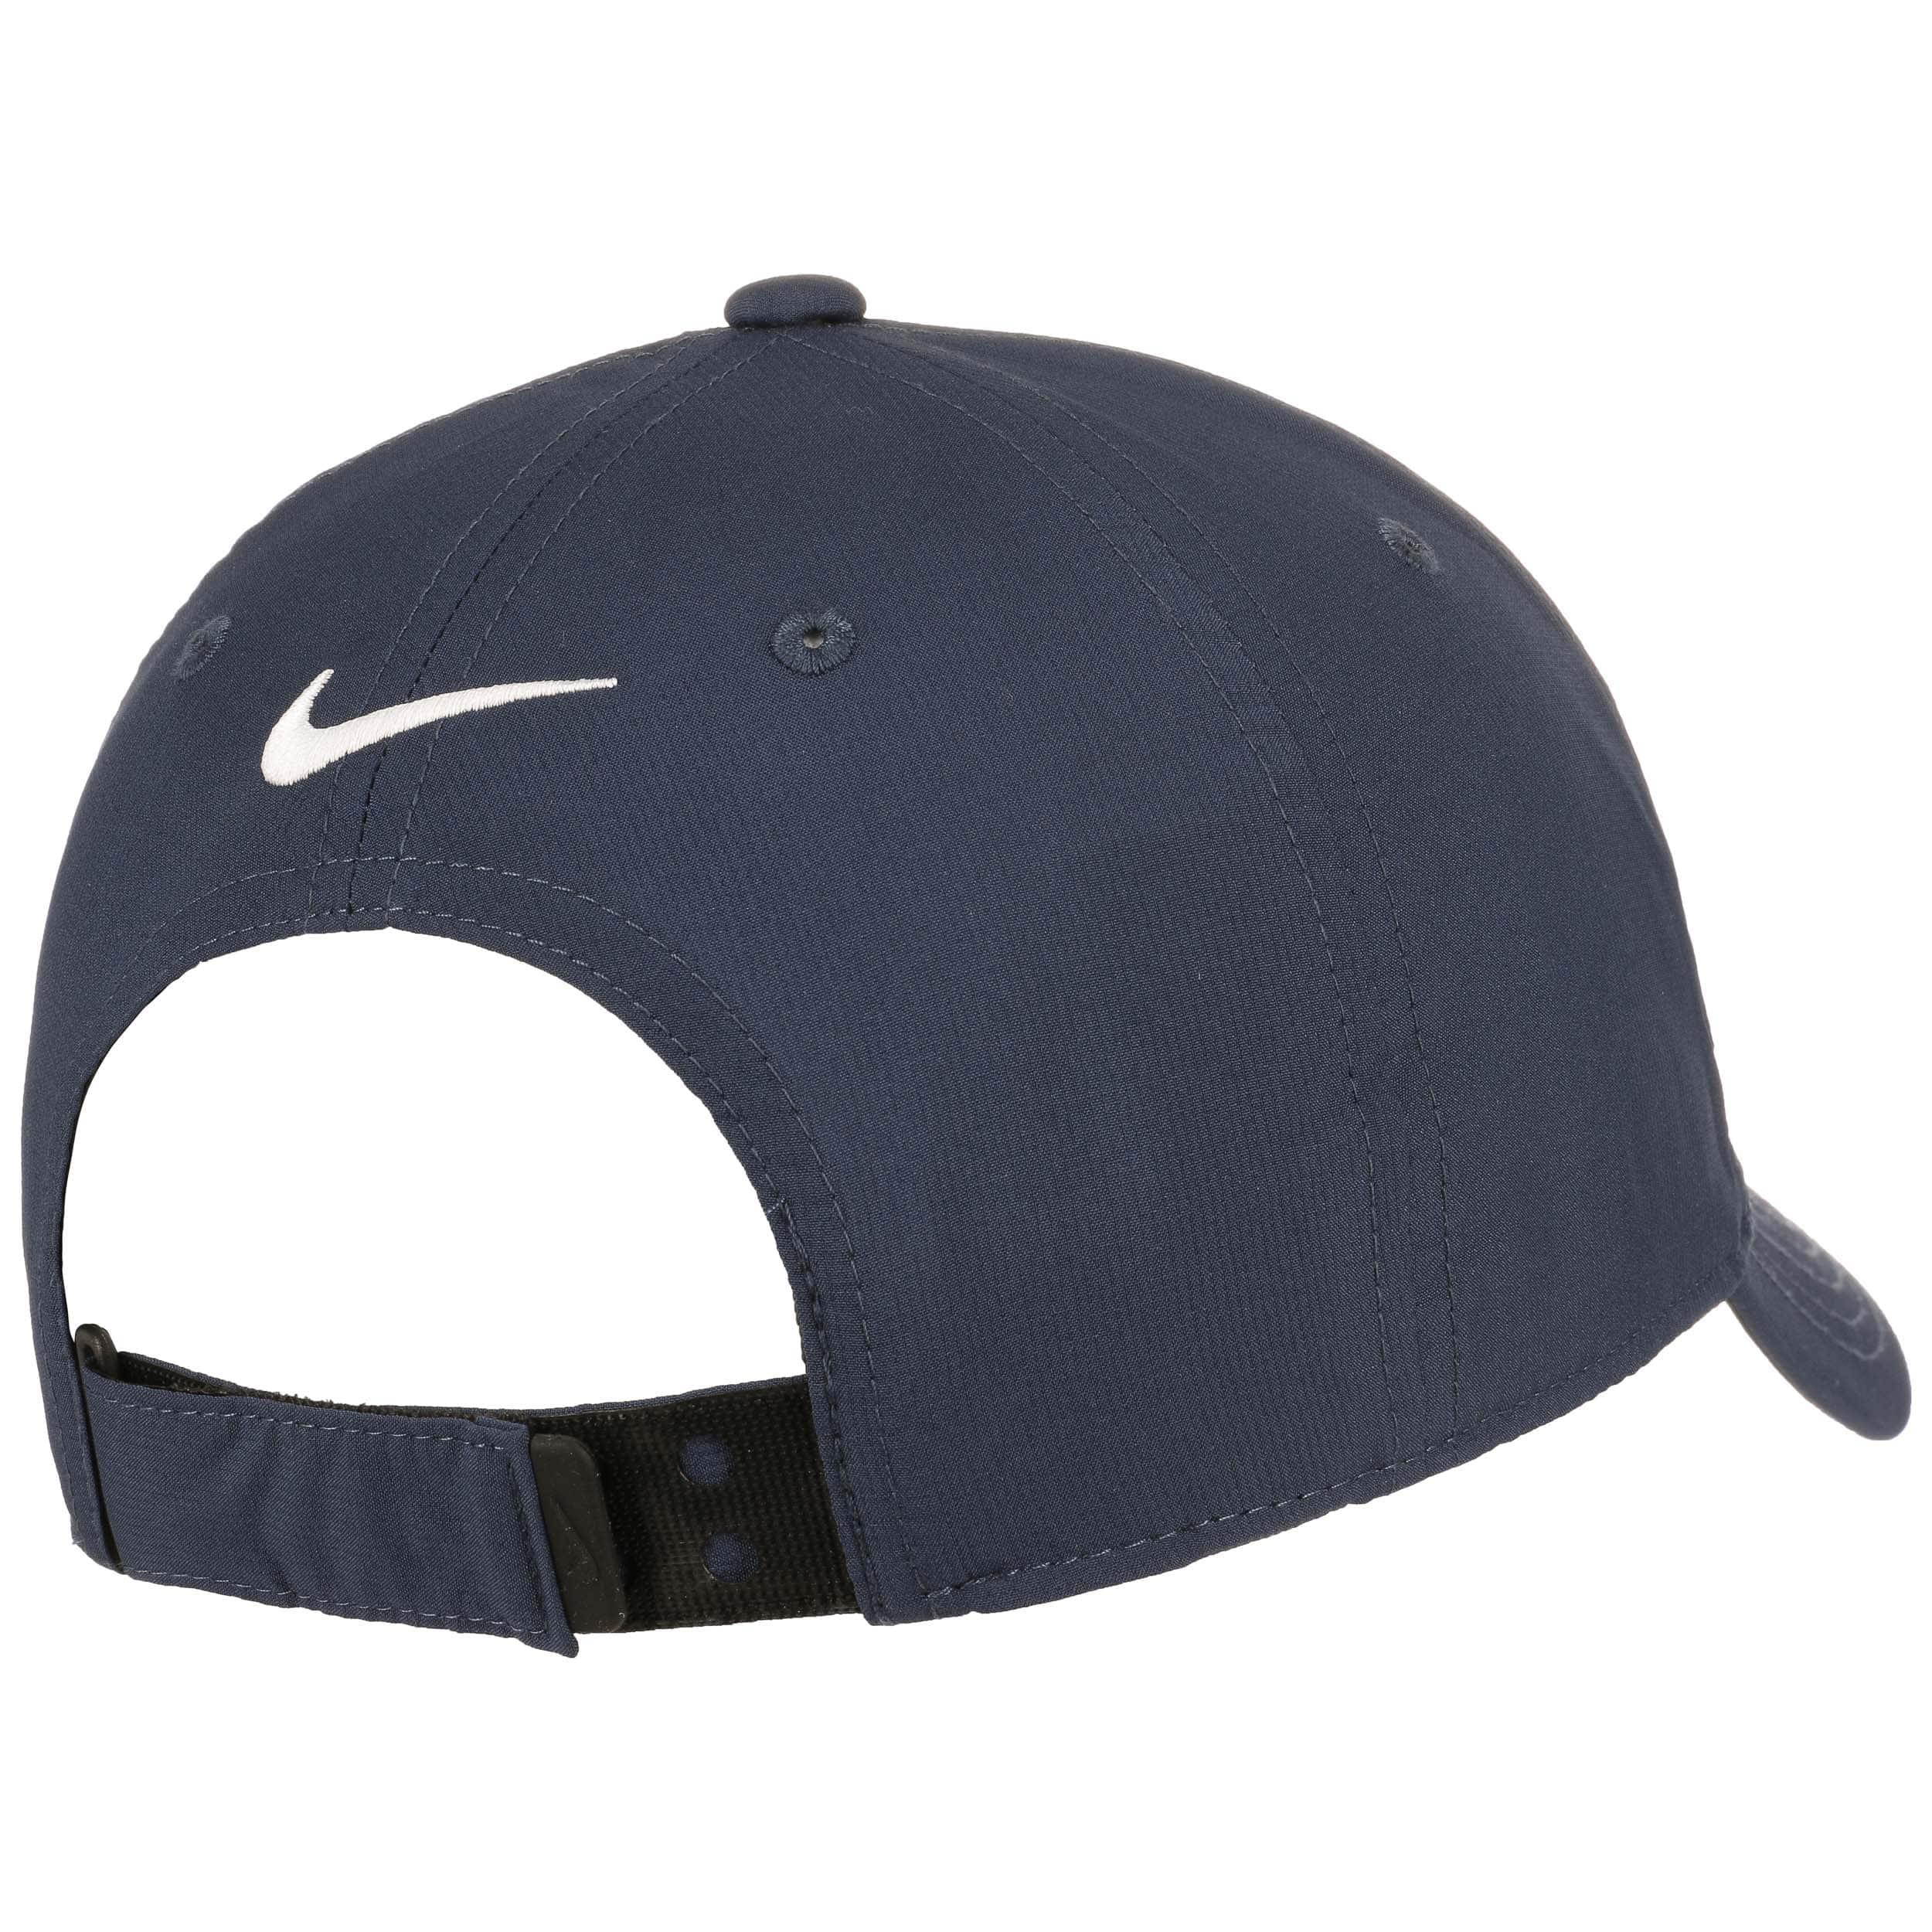 Gorra New Legacy 91 by Nike - Gorras - sombreroshop.es bb18e04769f